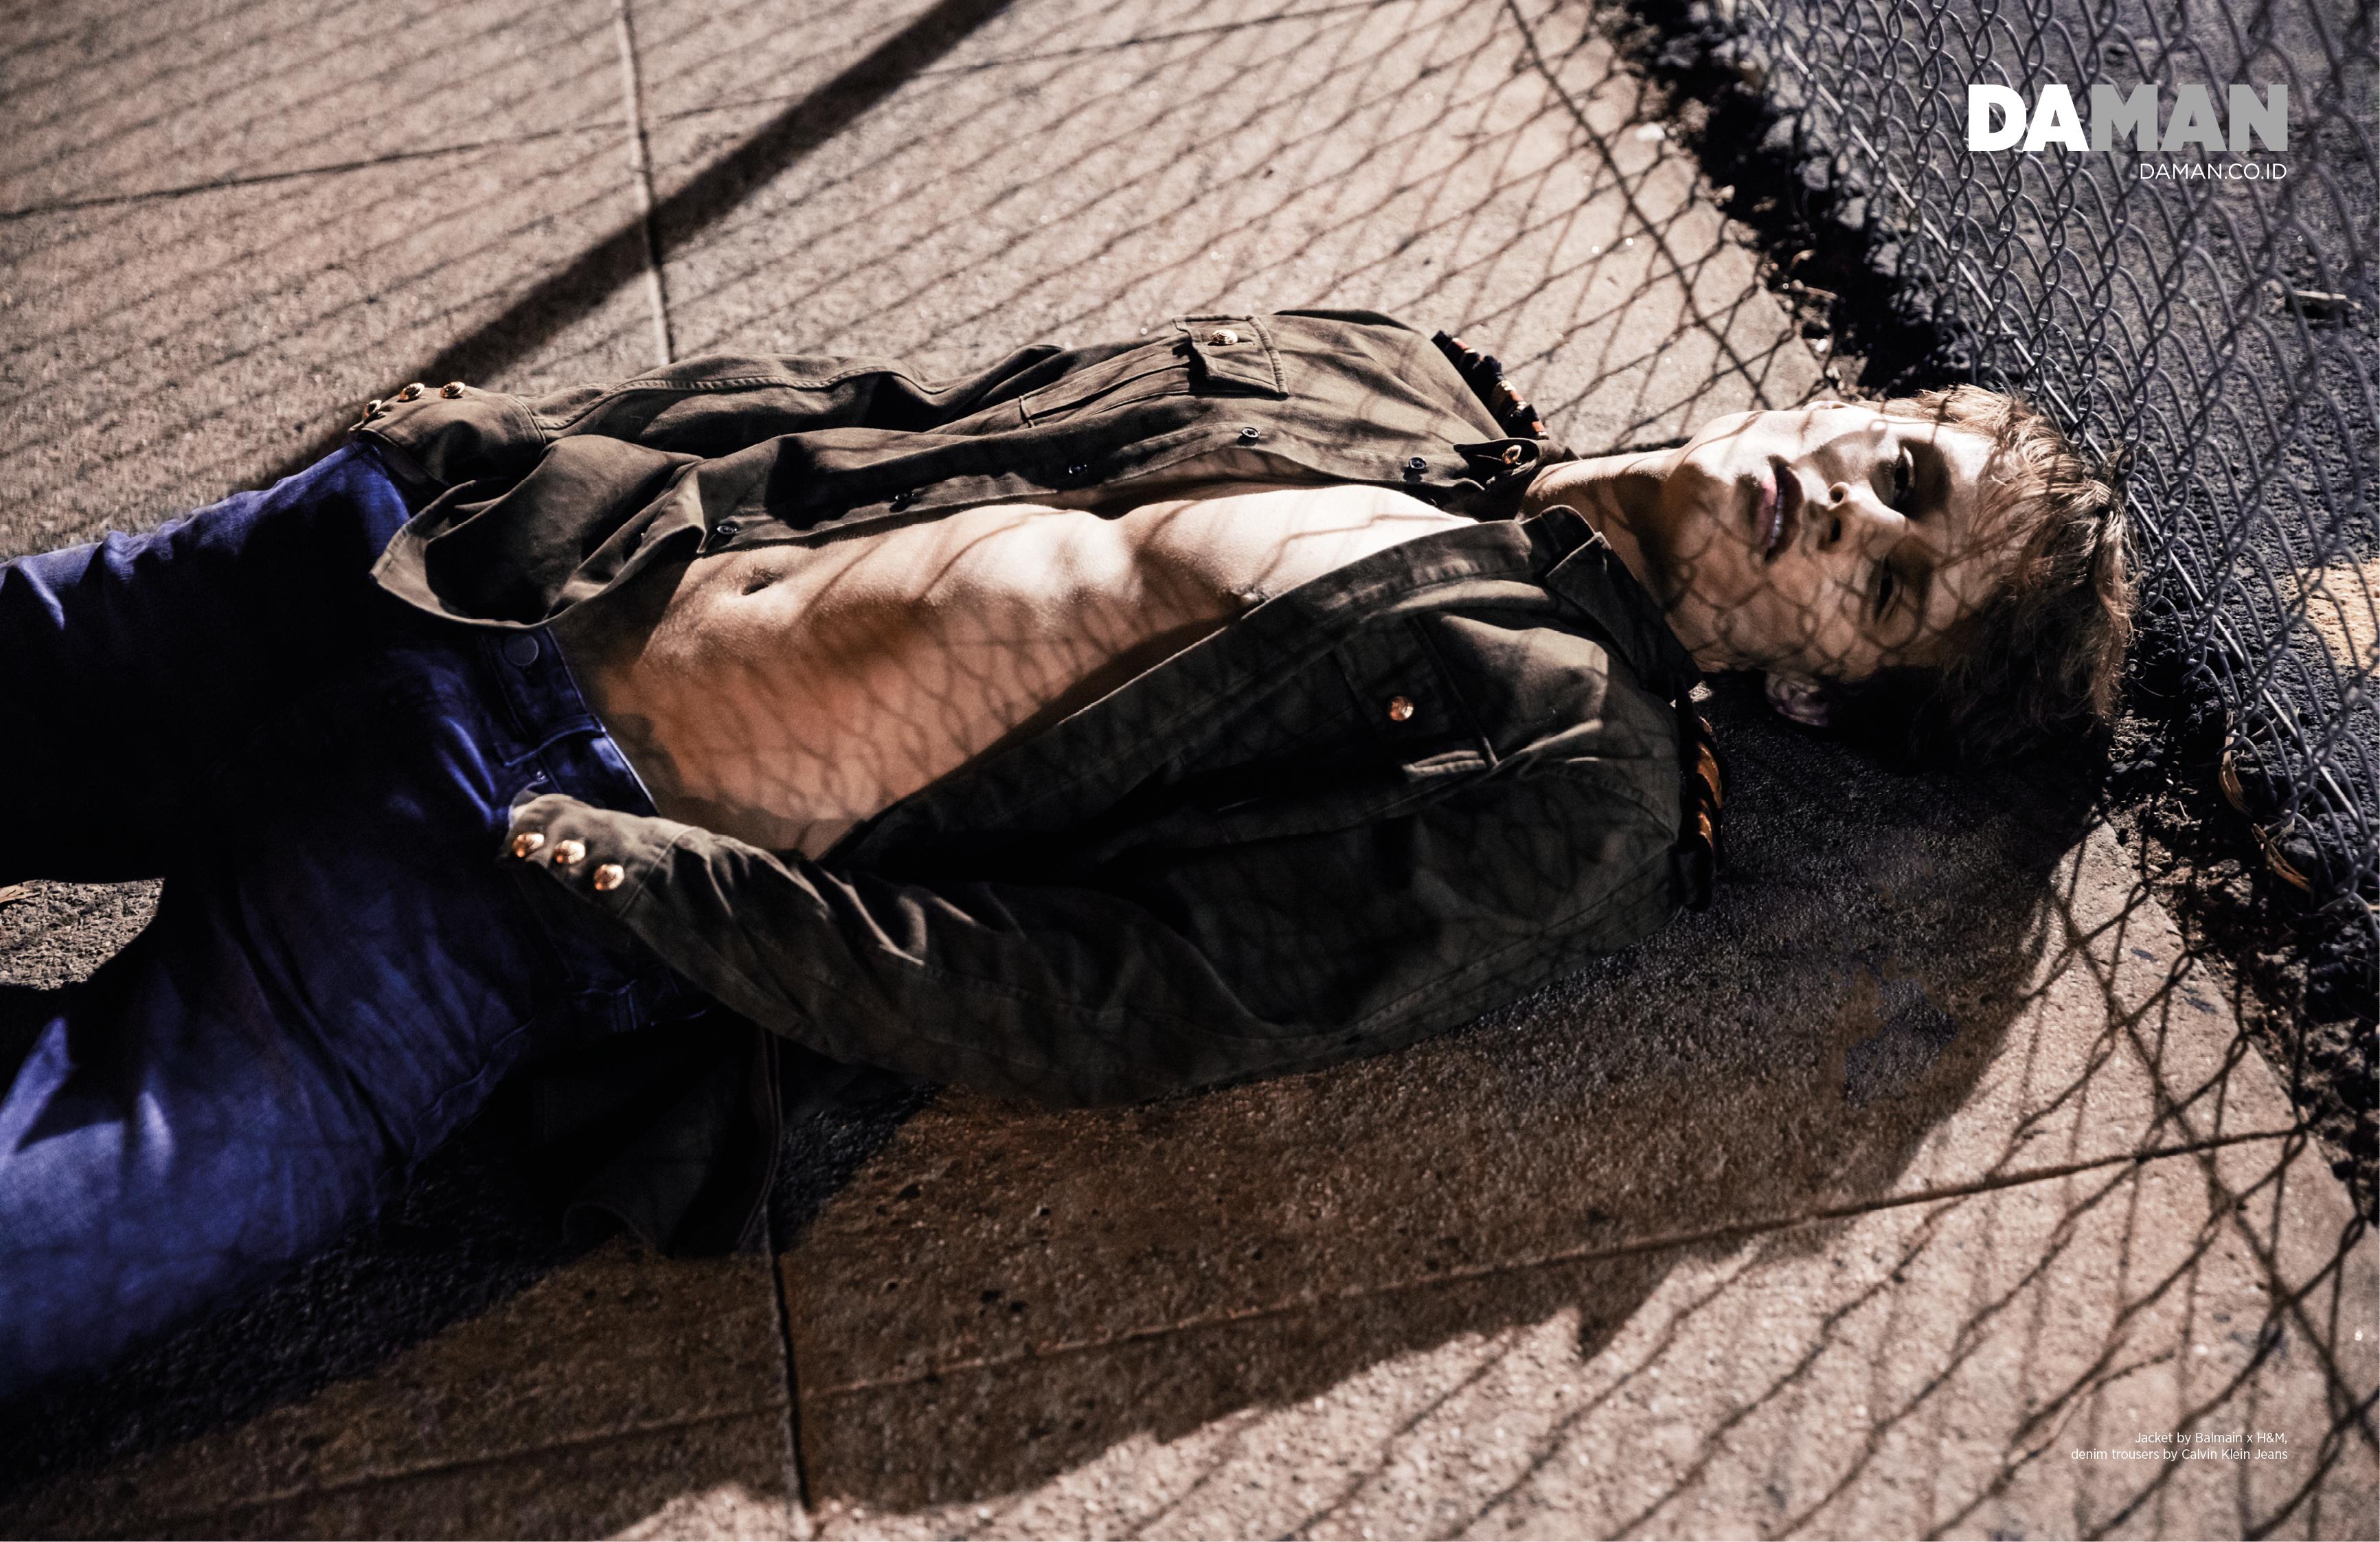 Andrew Raymond Thomas in Balmain x H&M and Calvin Klein Jeans